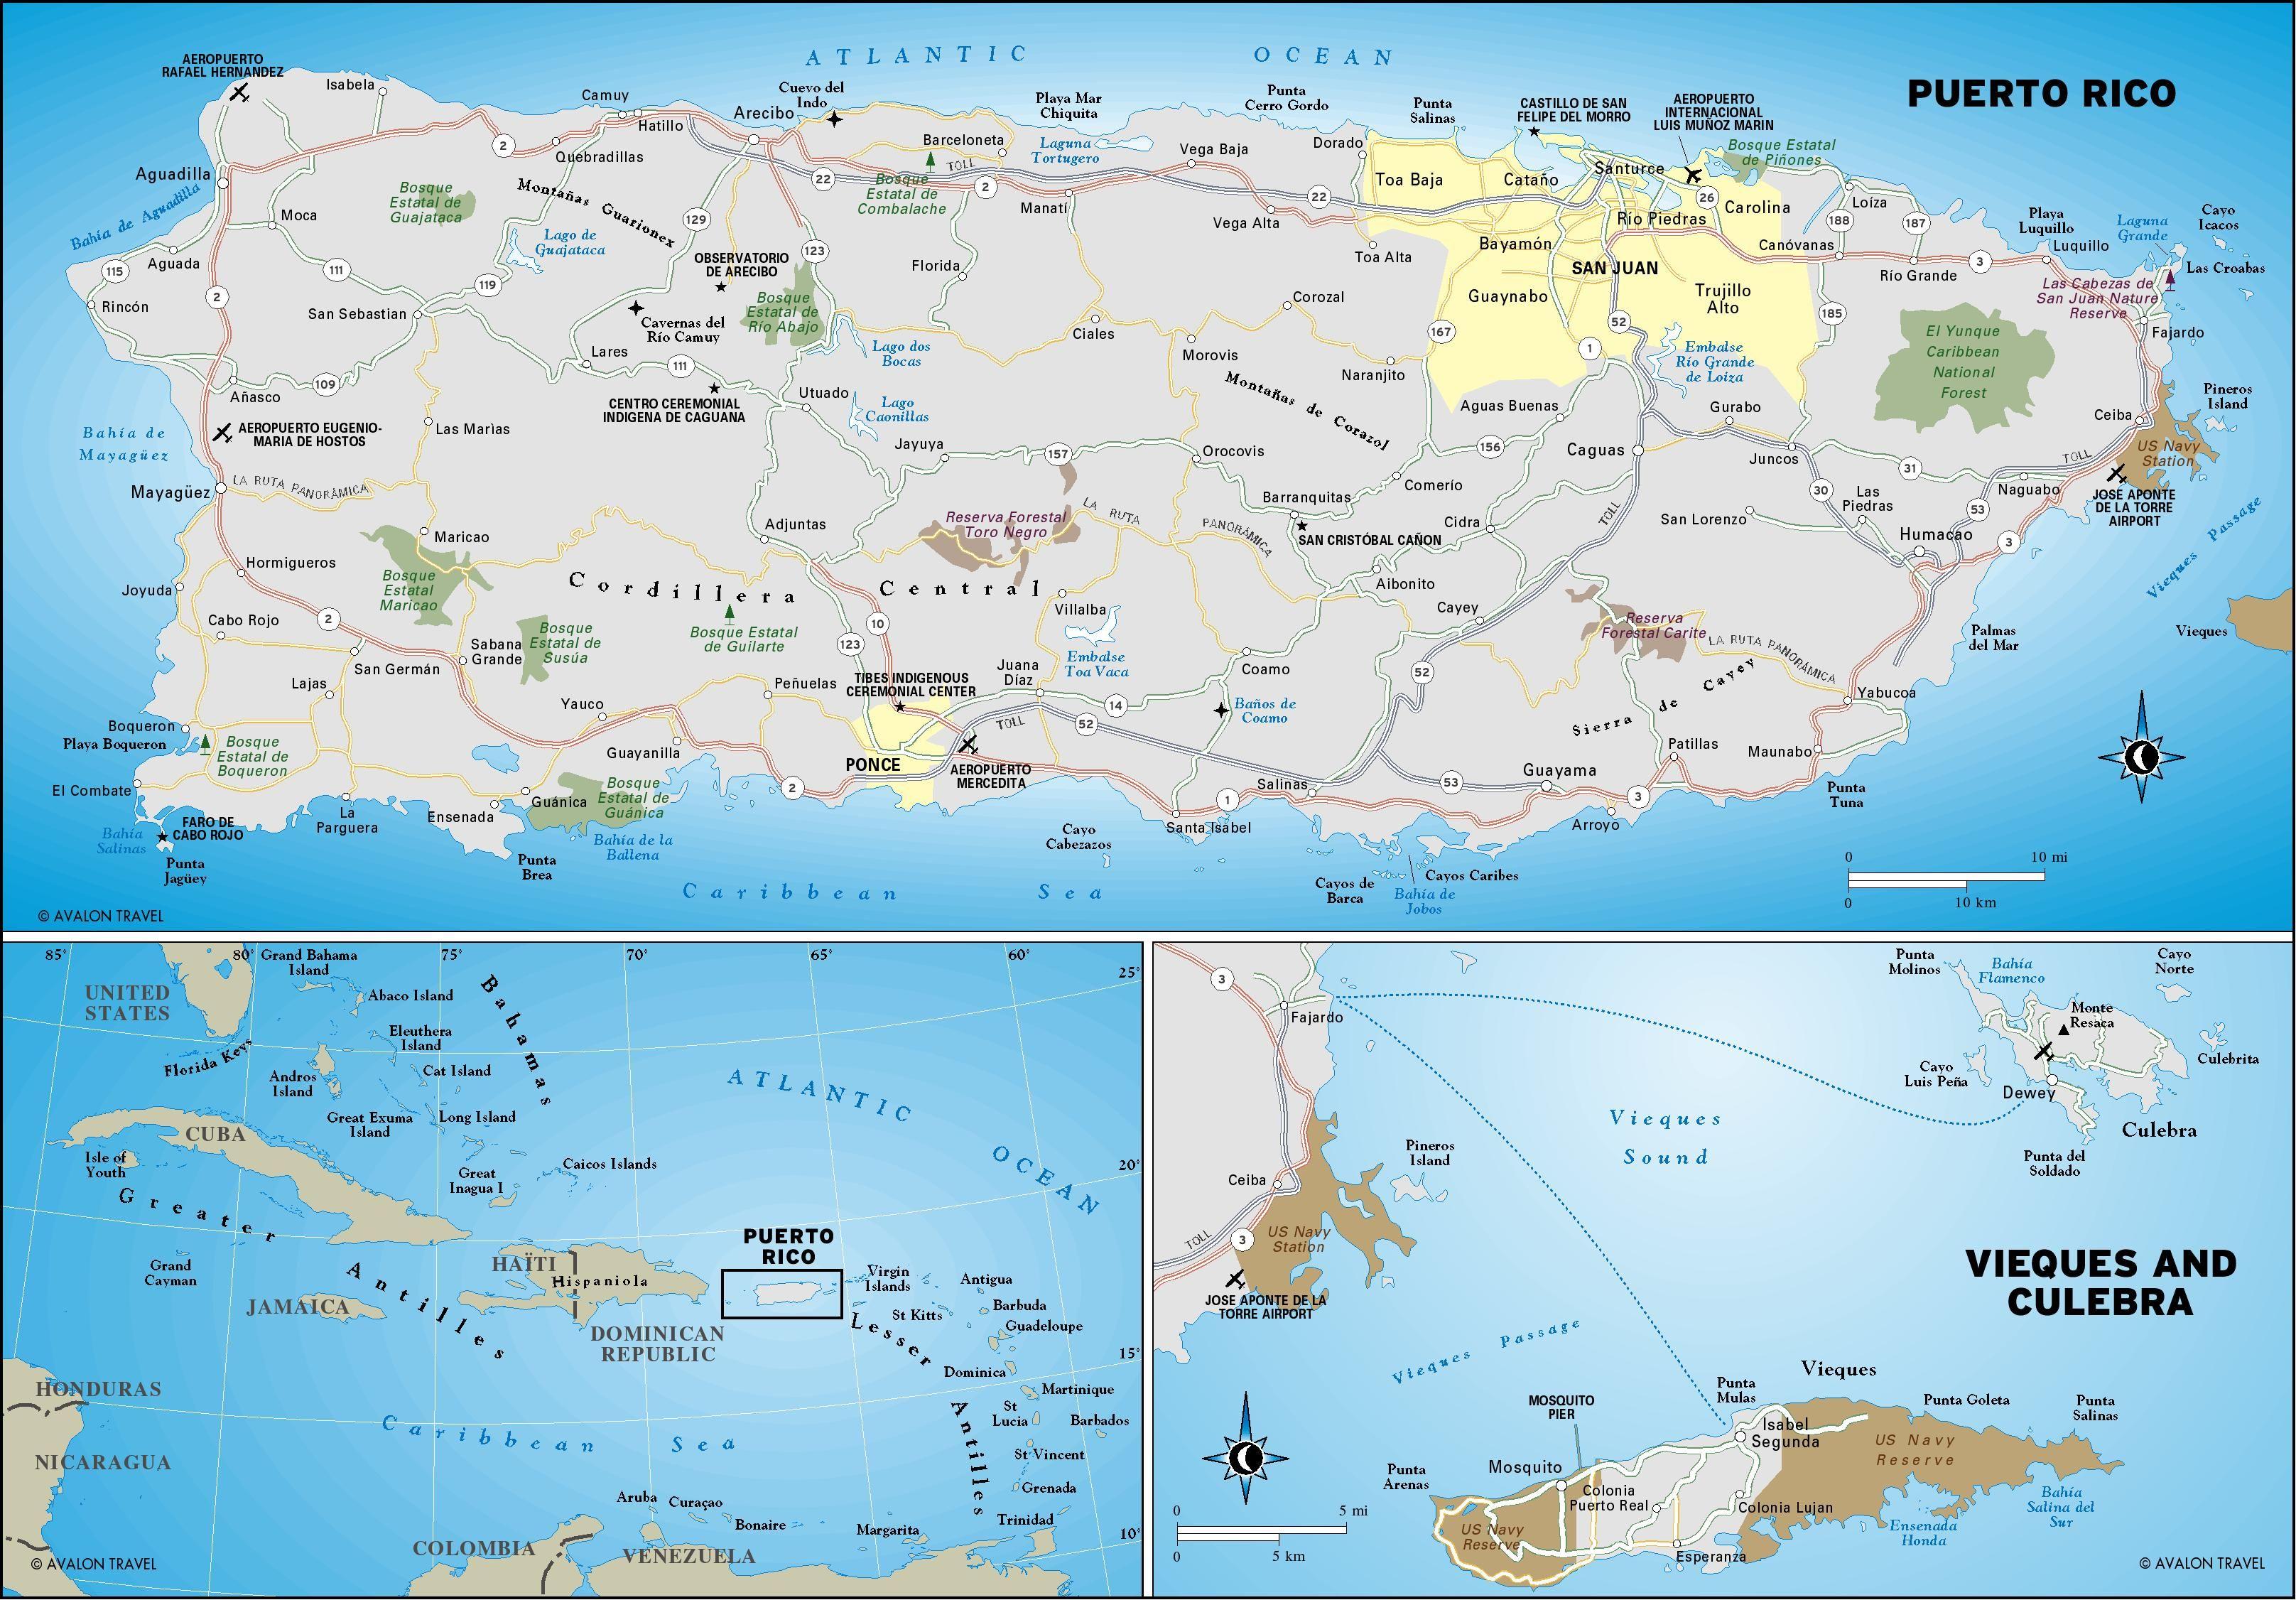 Puerto Rico Map (Geographic)   Puerto Rico   Puerto rico map ...